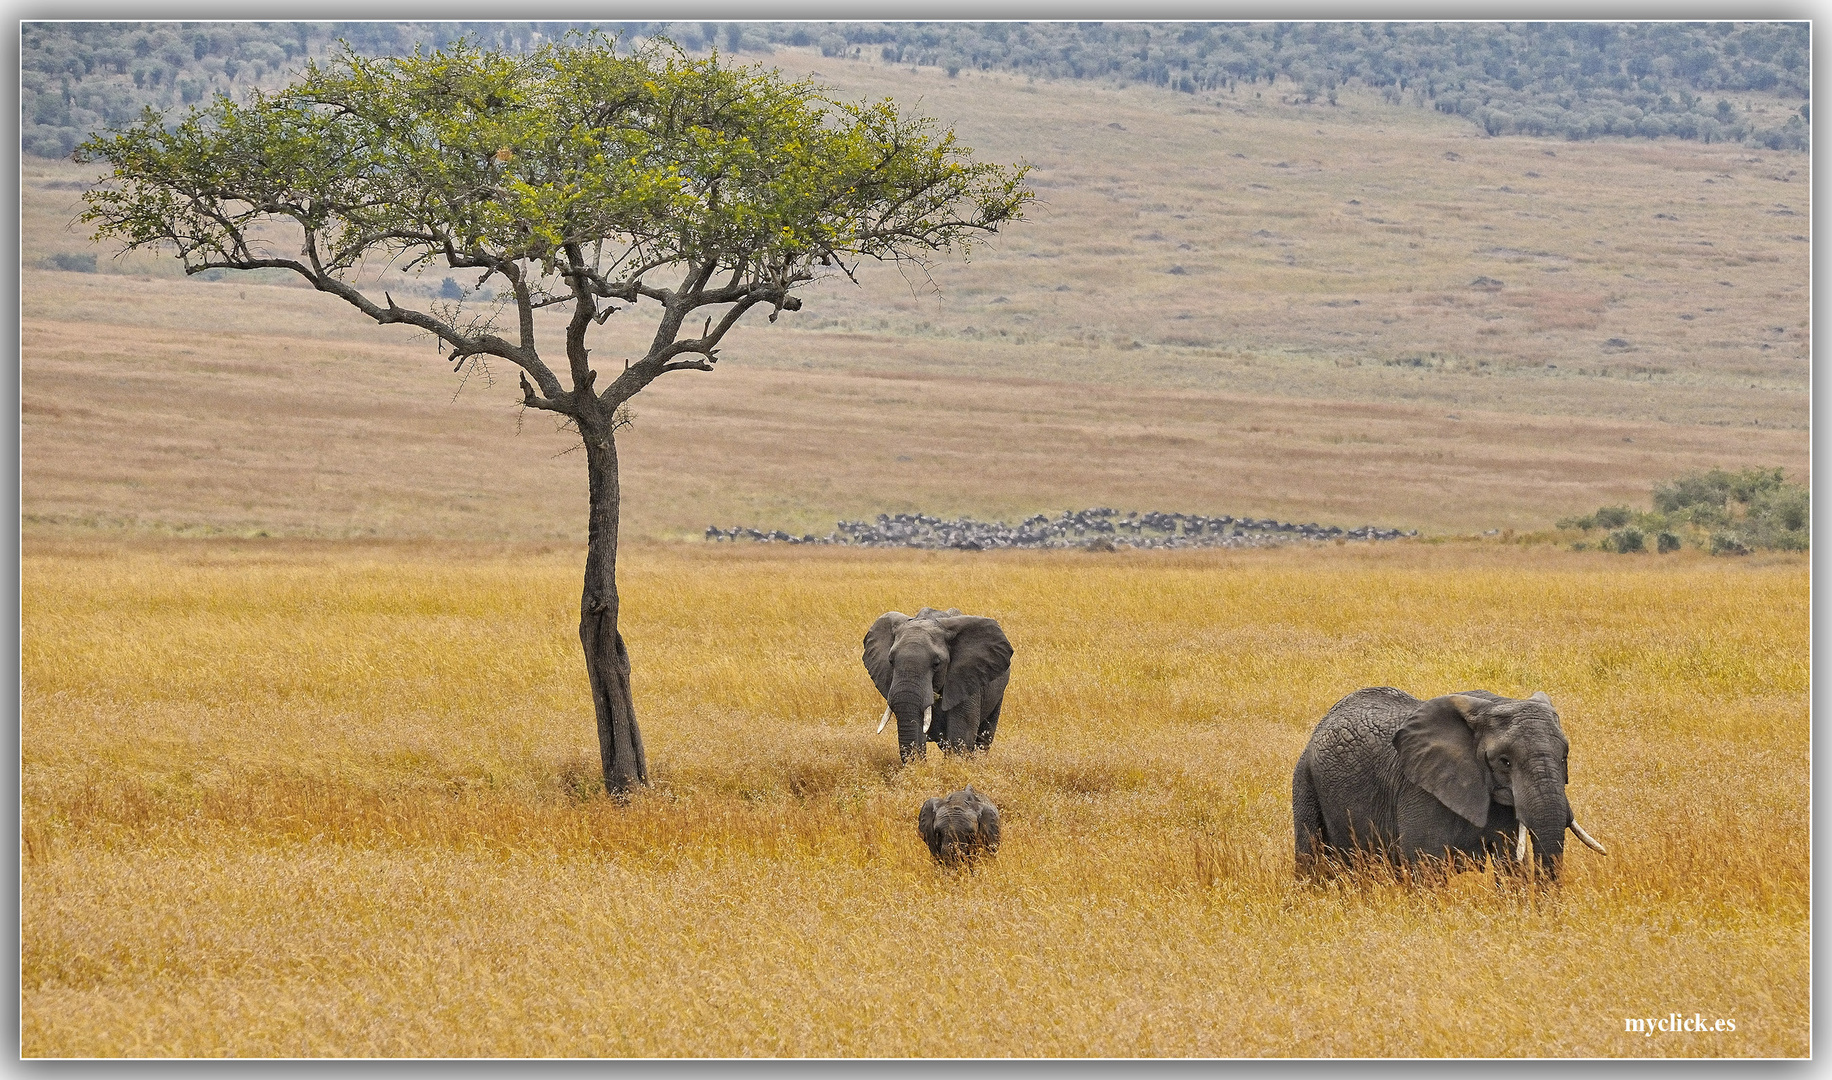 MEMORIAS DE AFRICA-ACACIA CON ELEFANTES-PN MASAI-MARA-KENIA